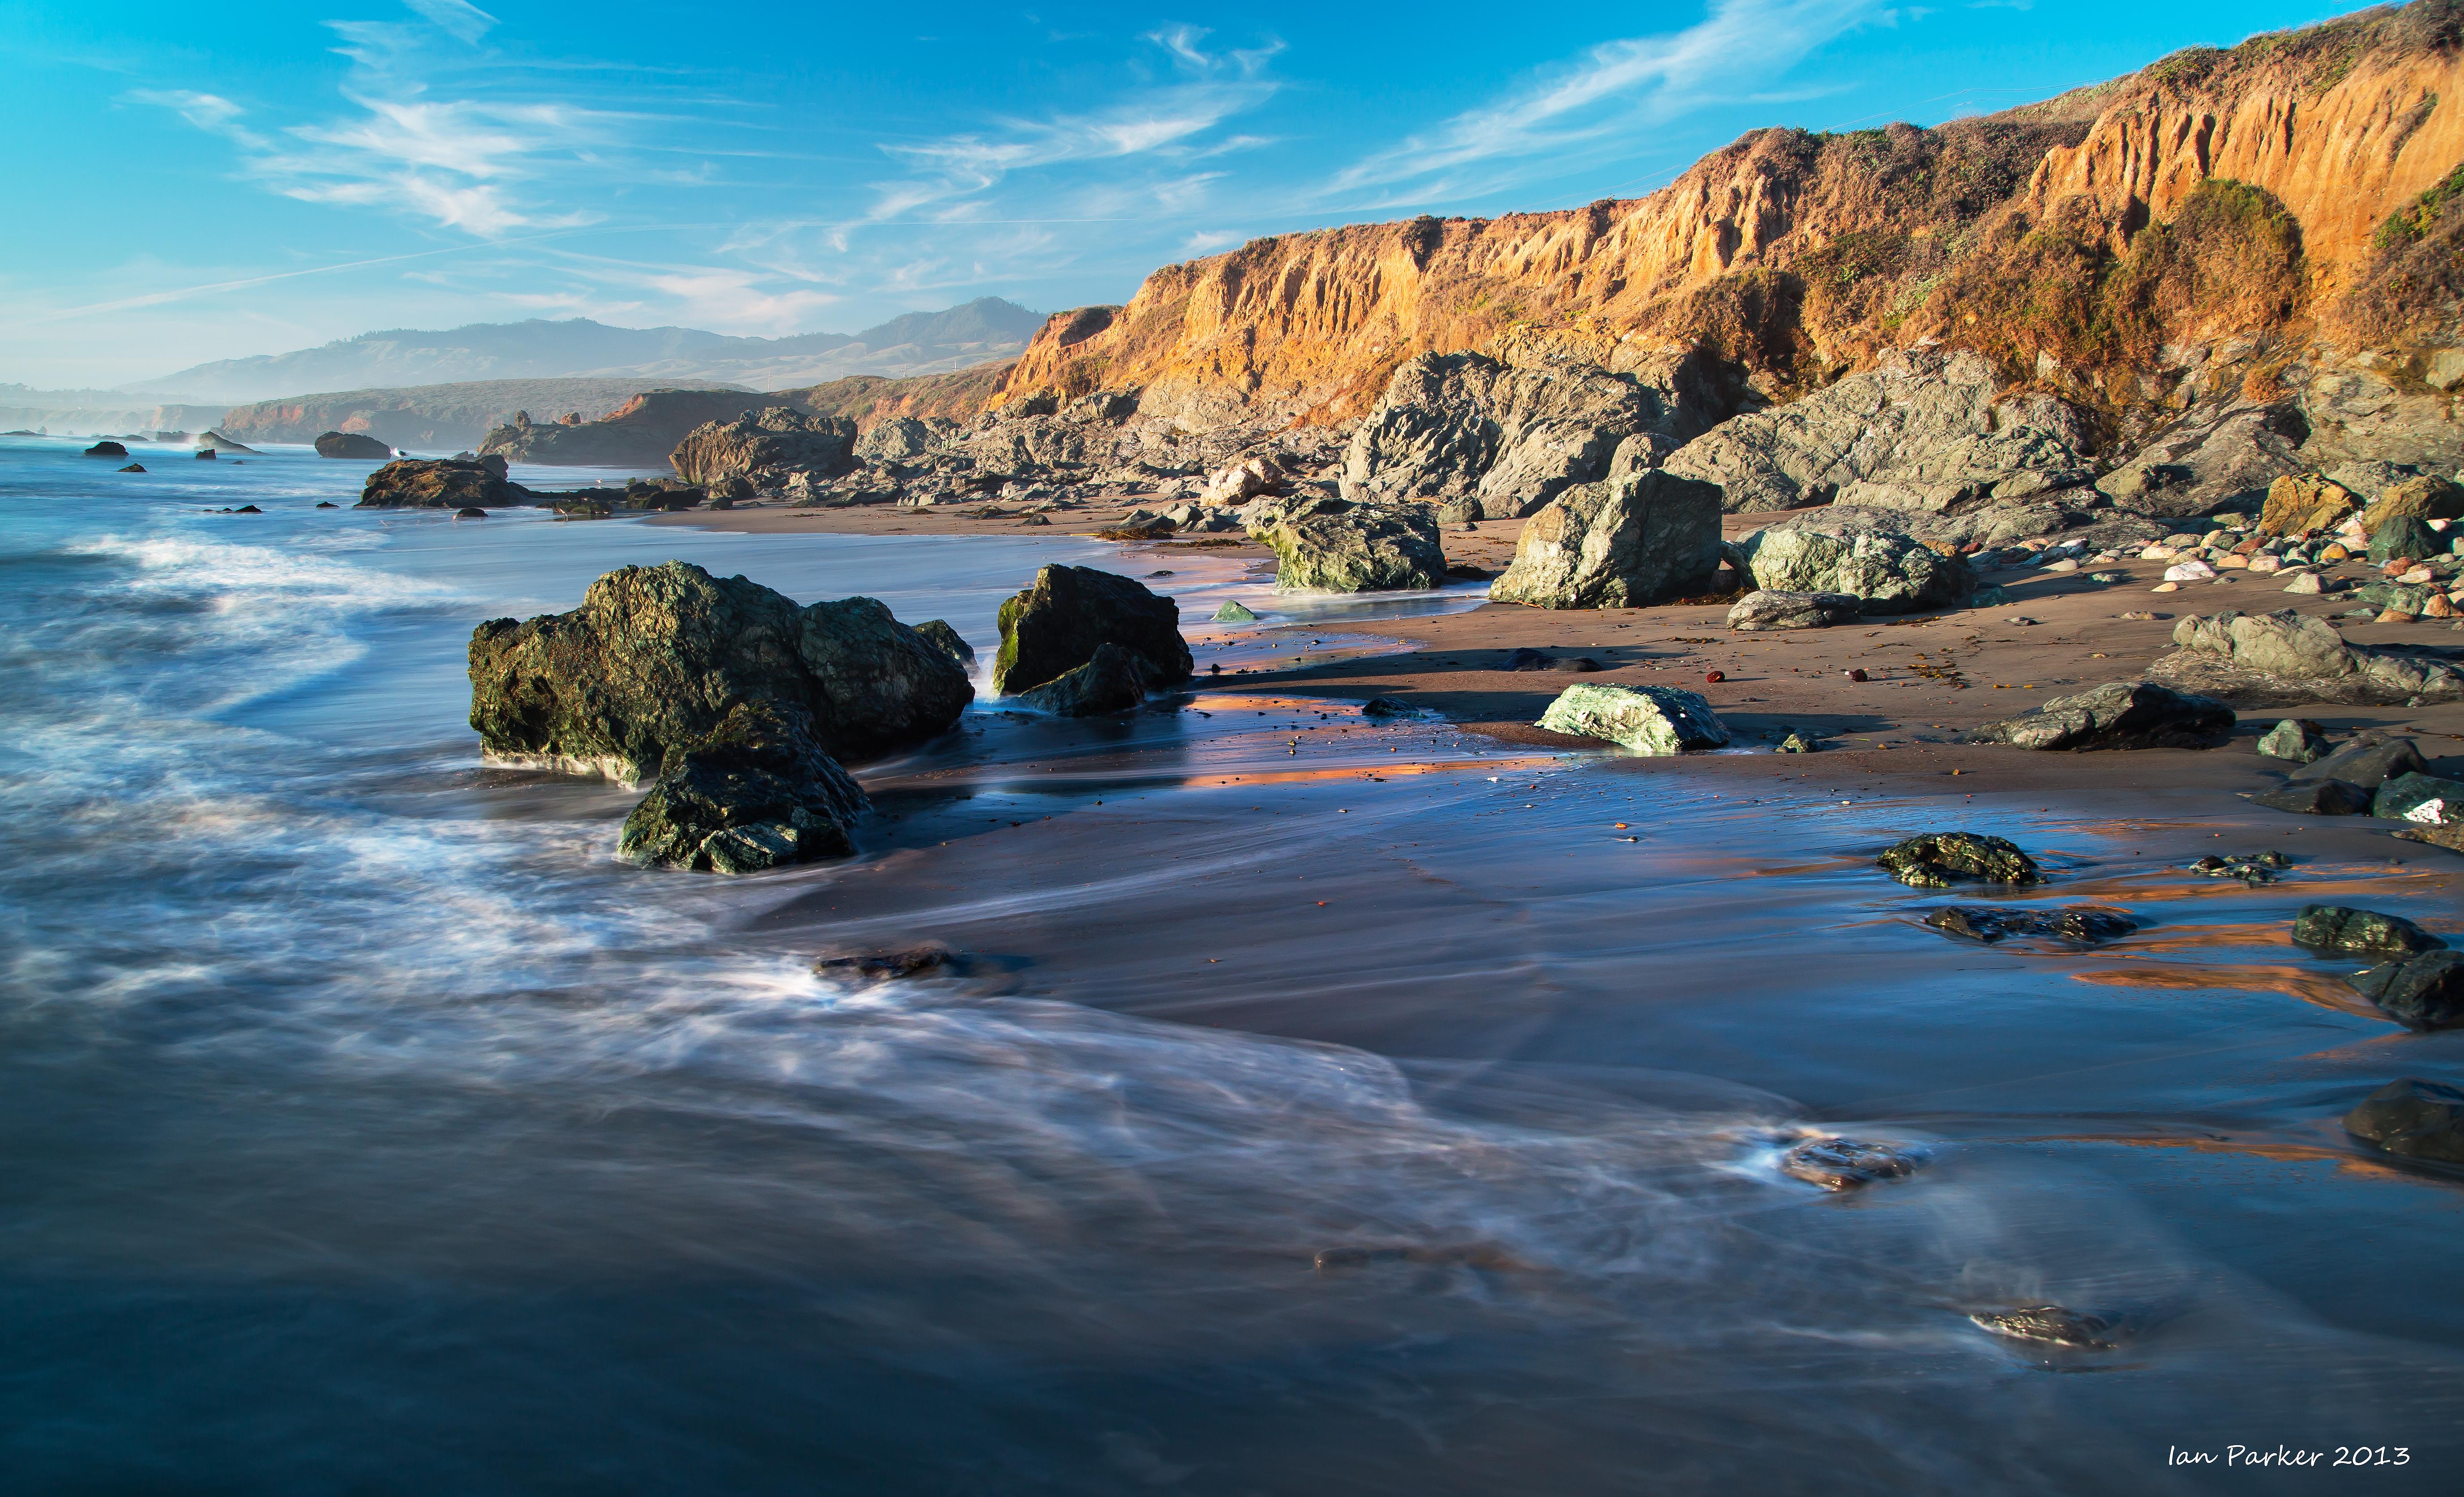 Evanescent Light California Coast 5504x3345